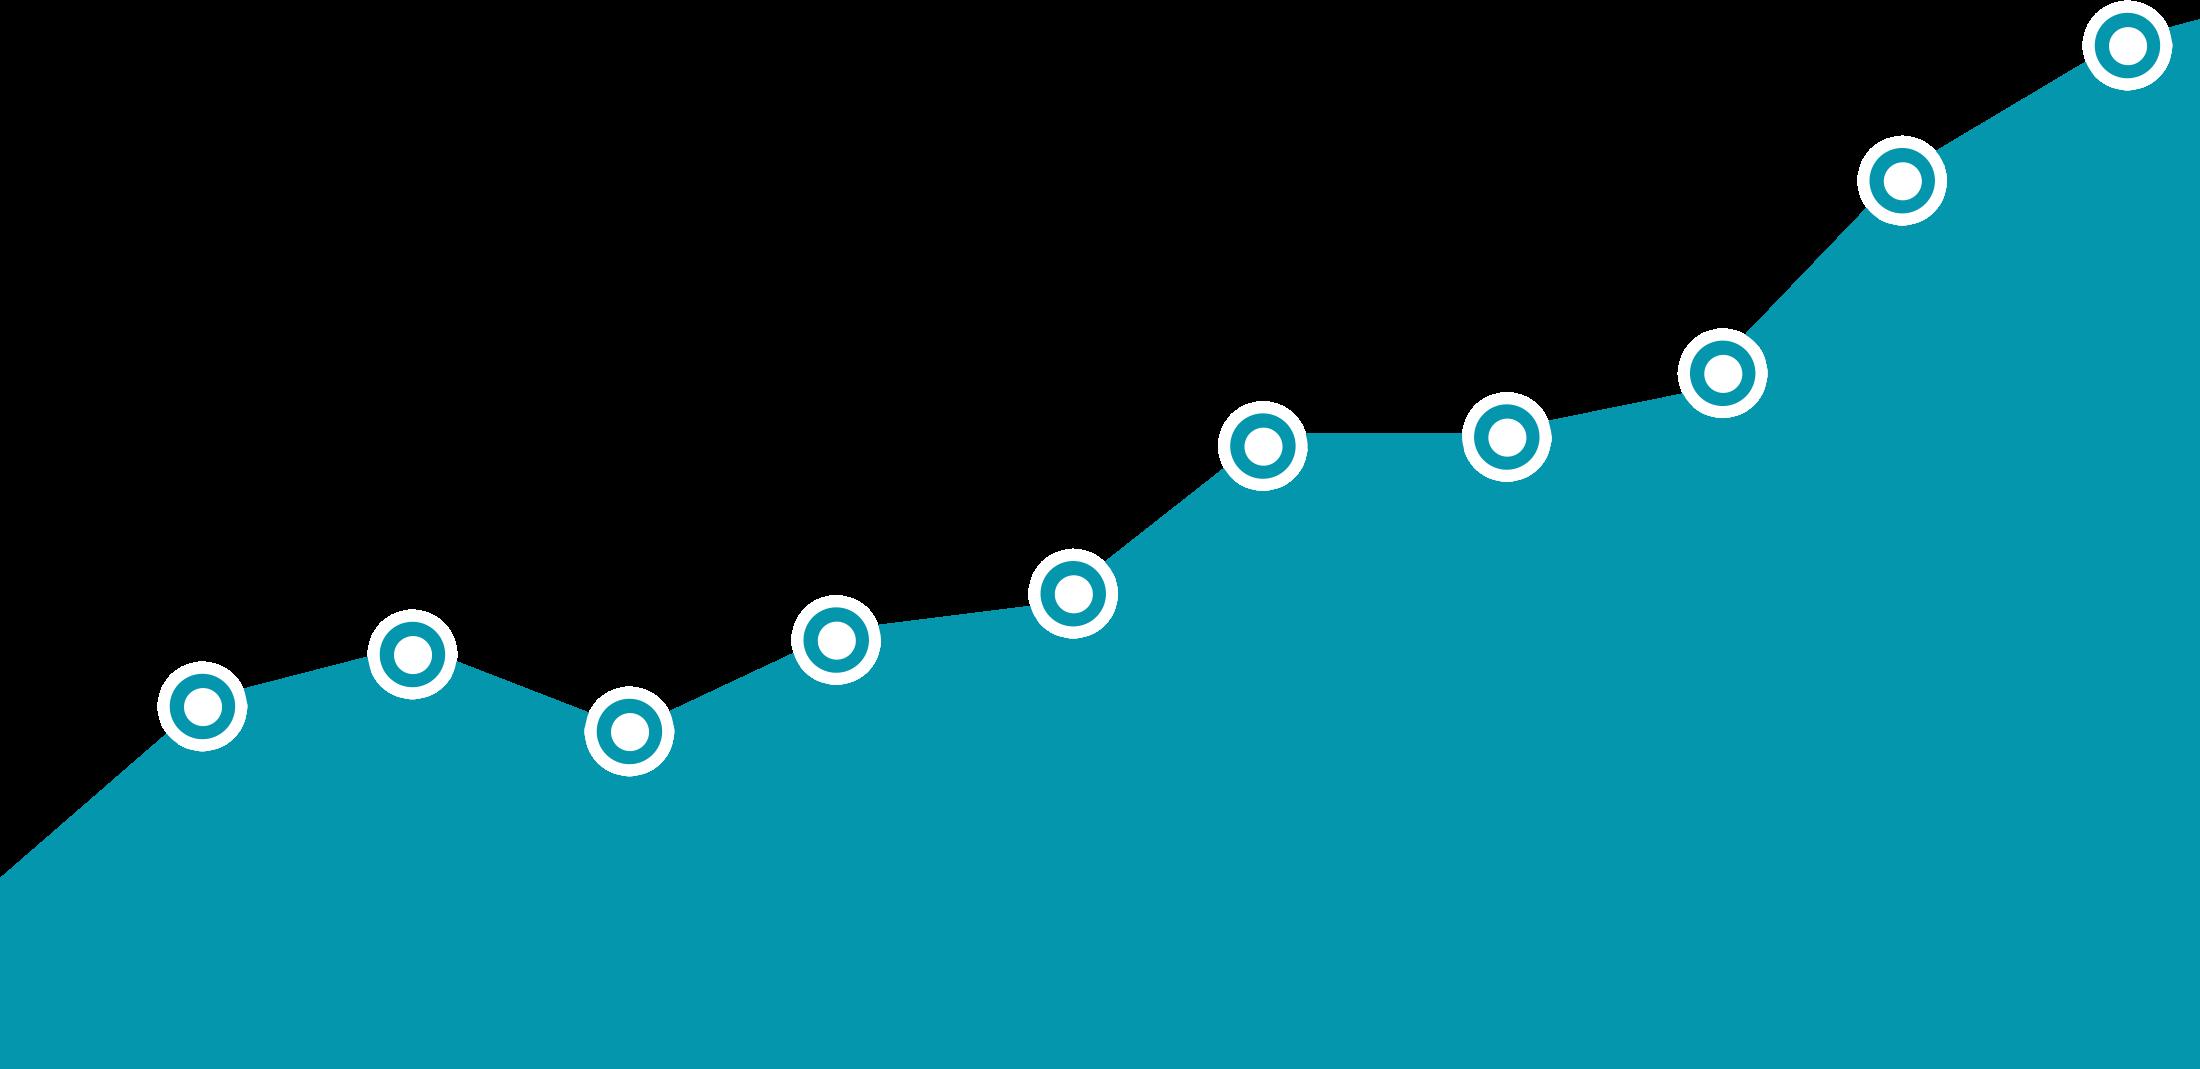 graph.png